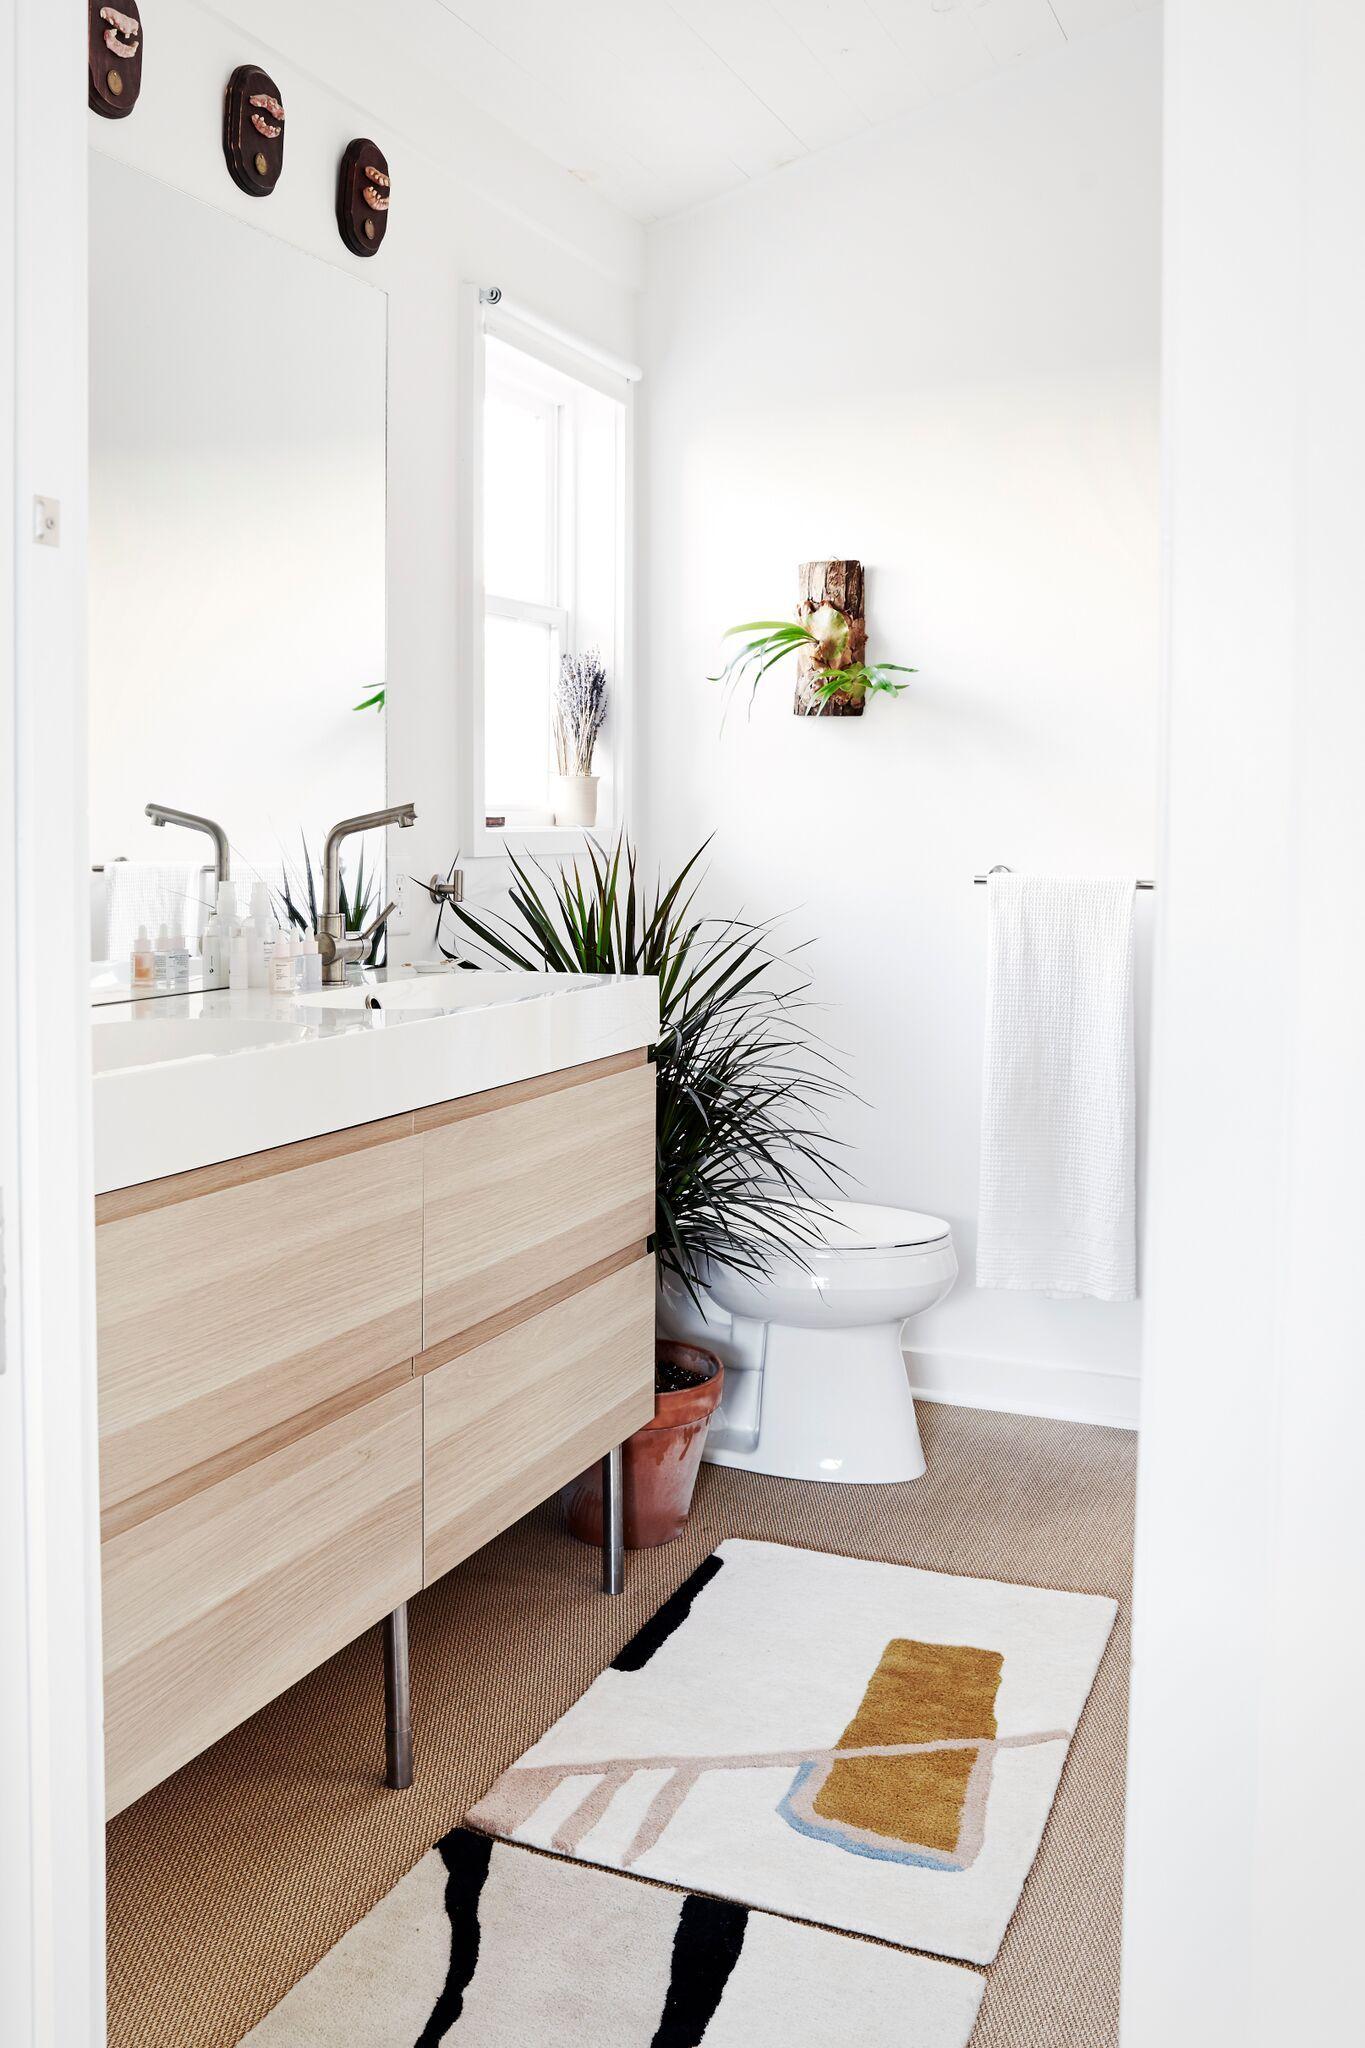 Enchanting Design Sponge Bathrooms Photo - Bathroom Design Ideas ...